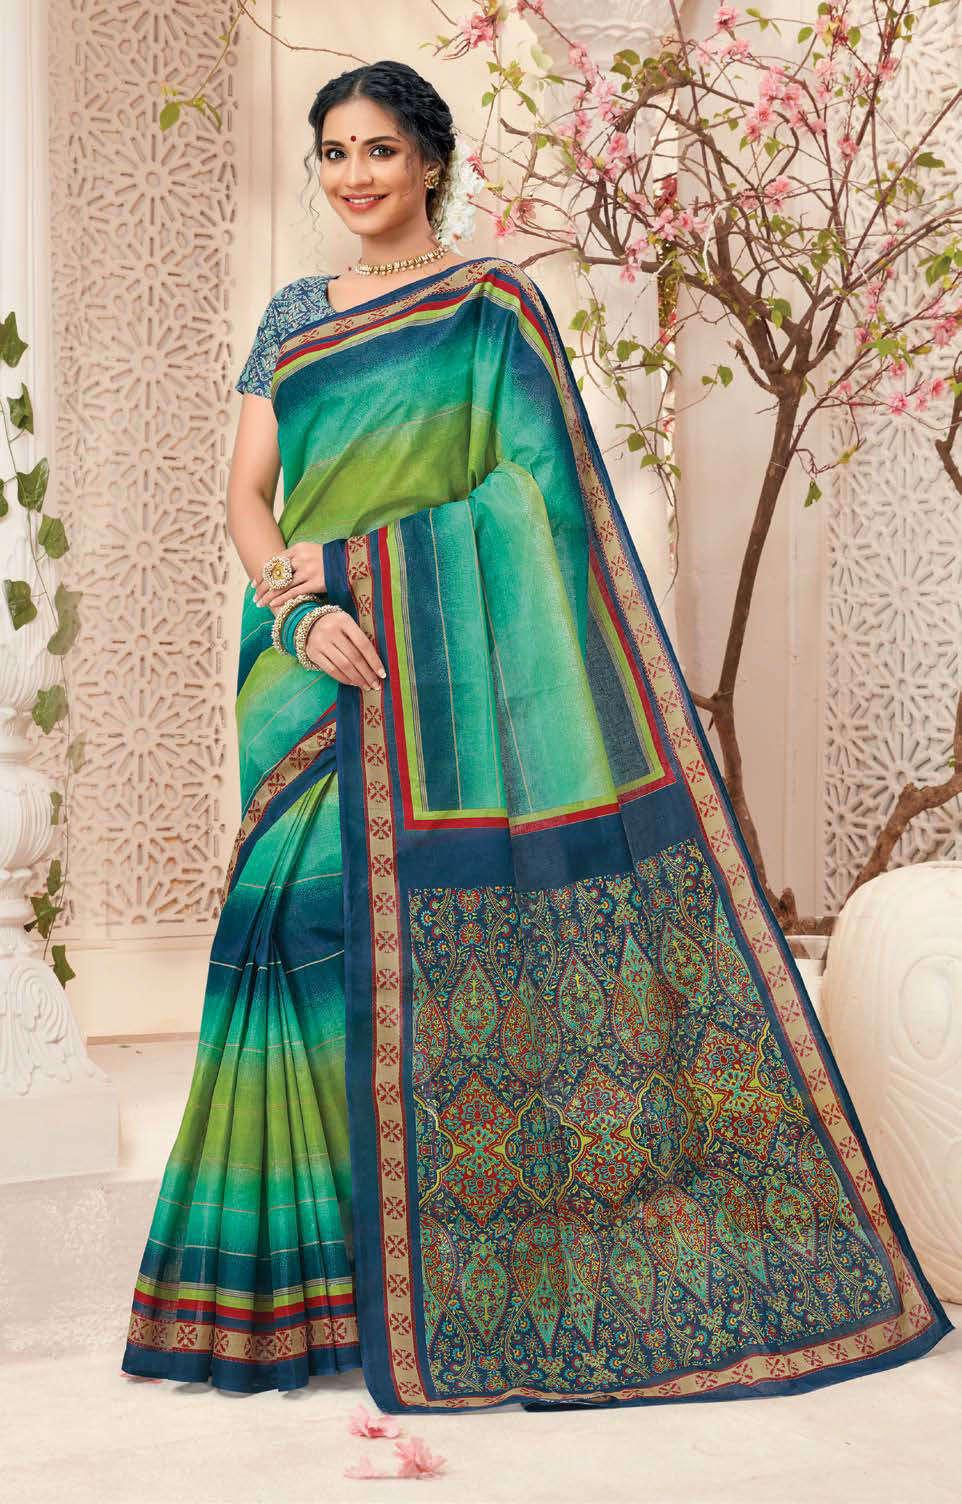 Deeptex Mother India Vol 38 A Saree Sari Wholesale Catalog 18 Pcs 1 - Deeptex Mother India Vol 38 A Saree Sari Wholesale Catalog 18 Pcs